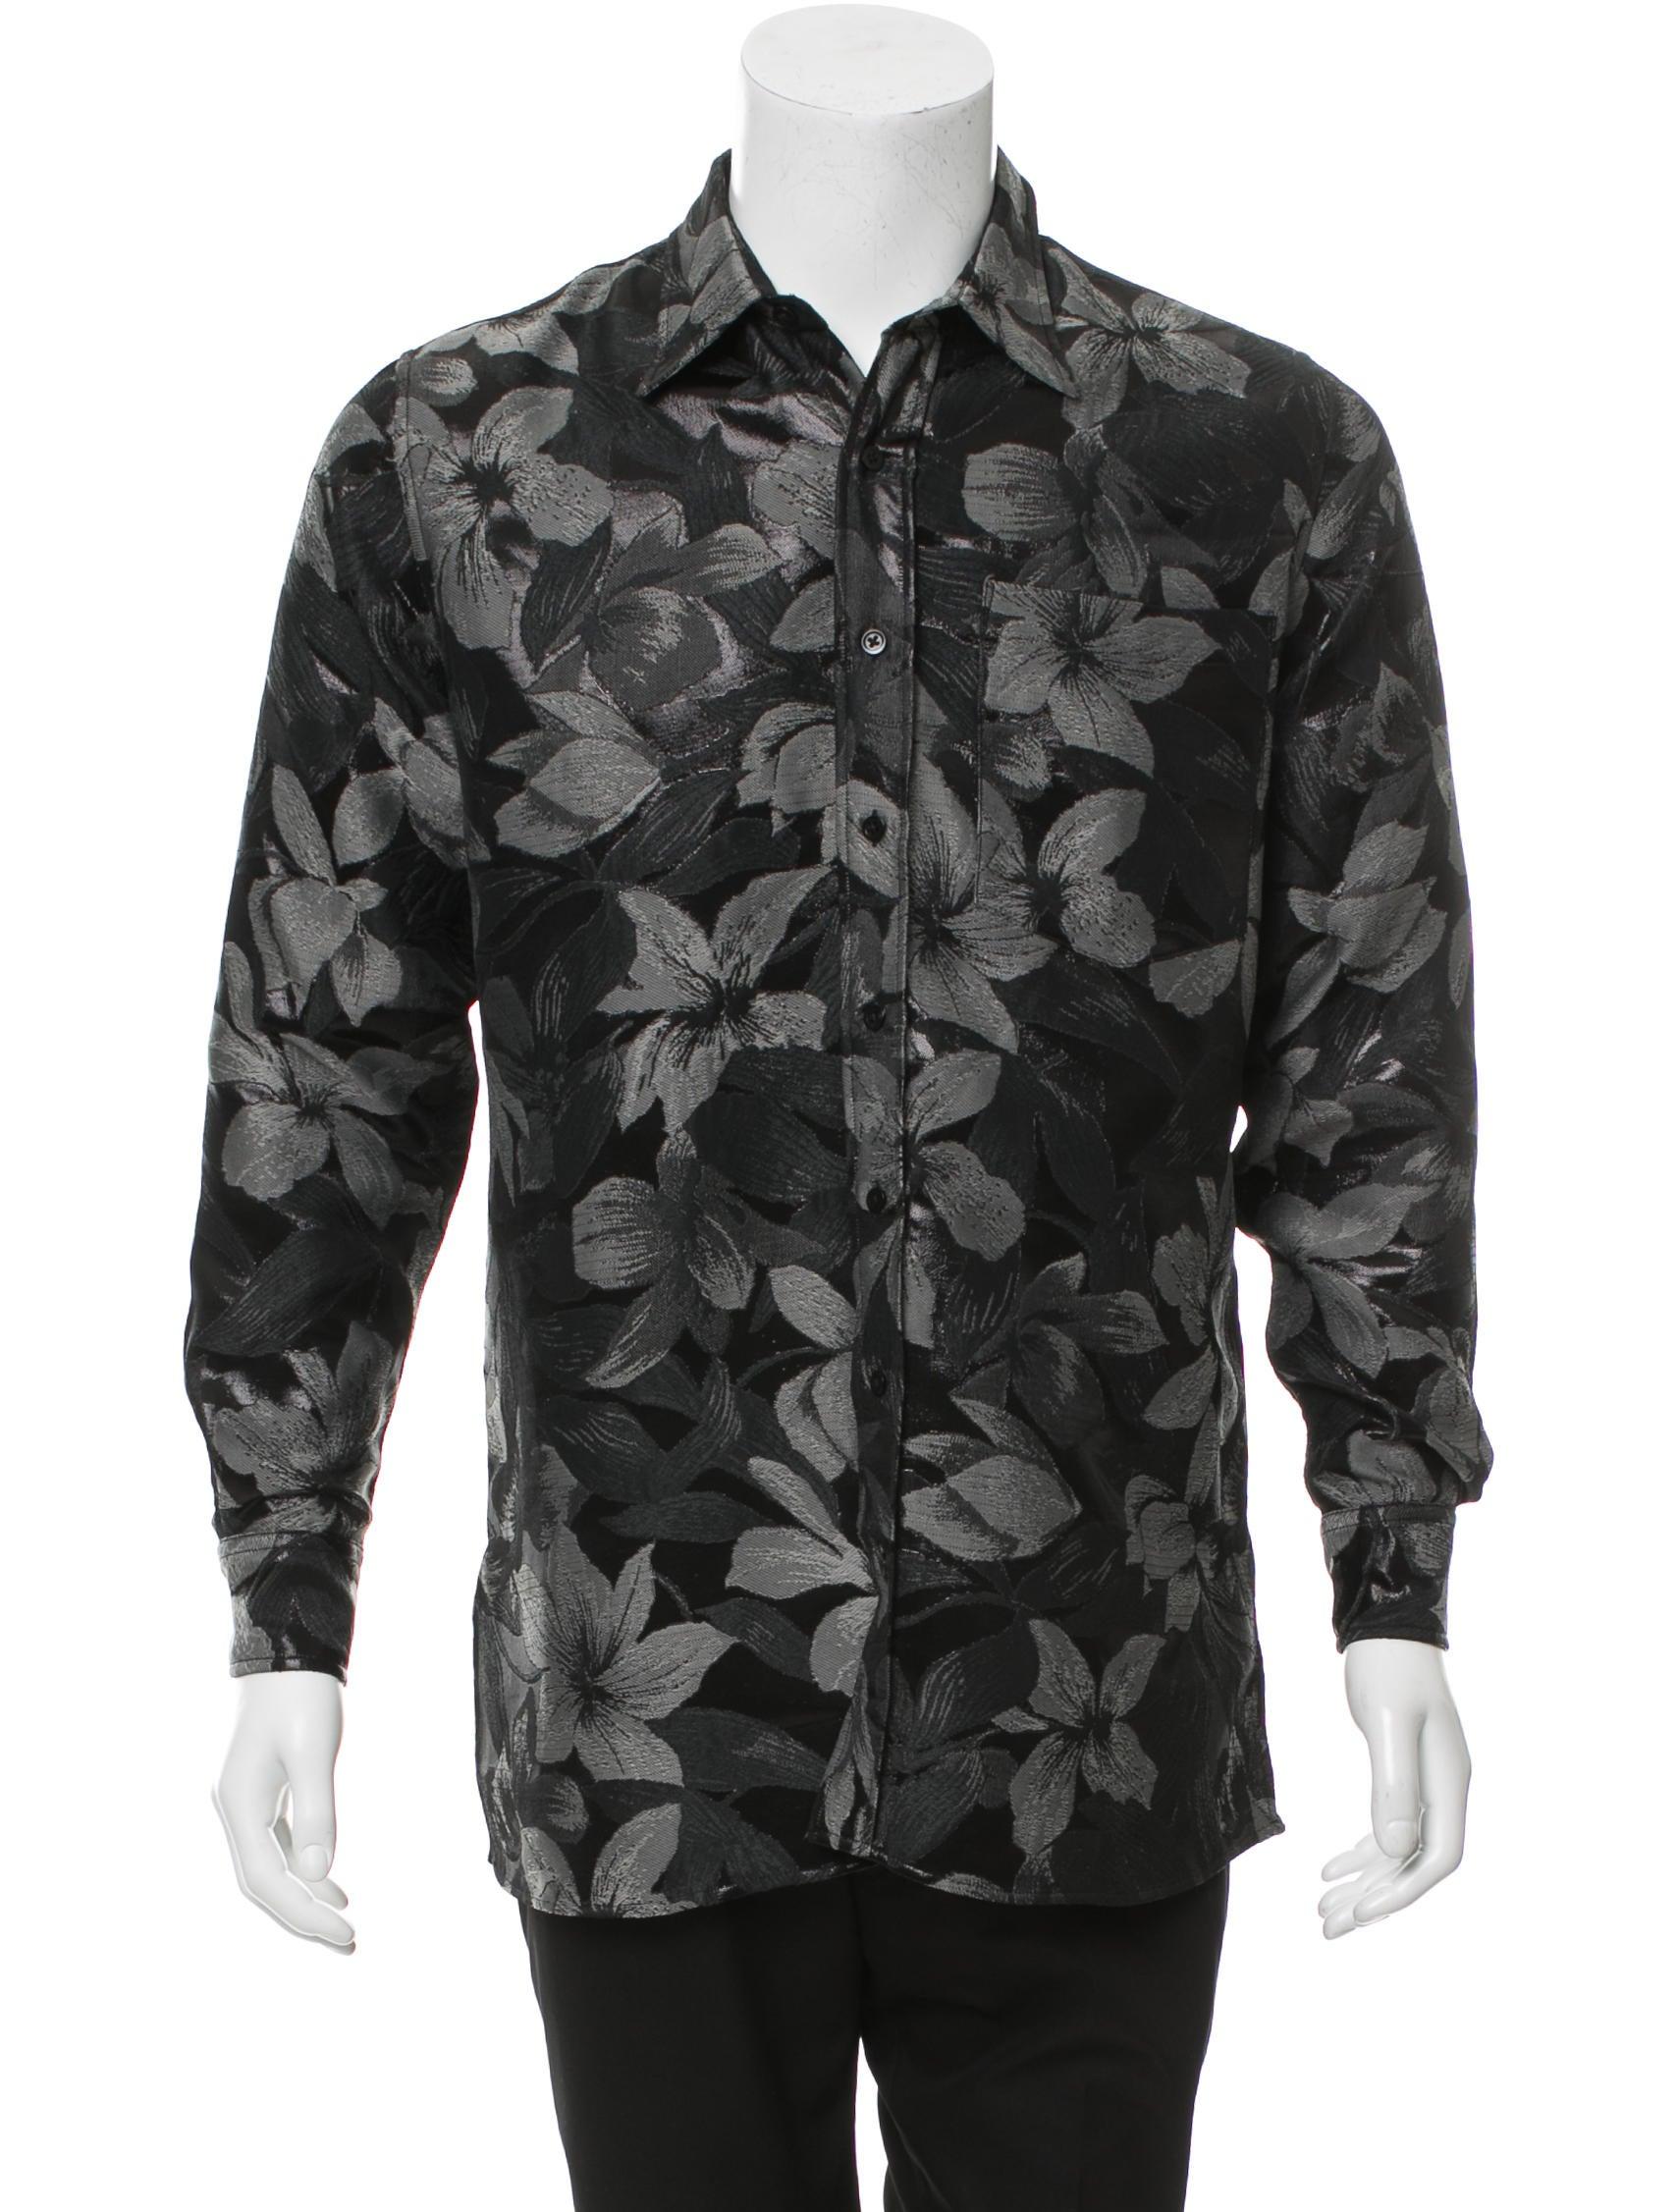 Ami alexandre mattiussi floral print button up shirt for Floral print button up shirt